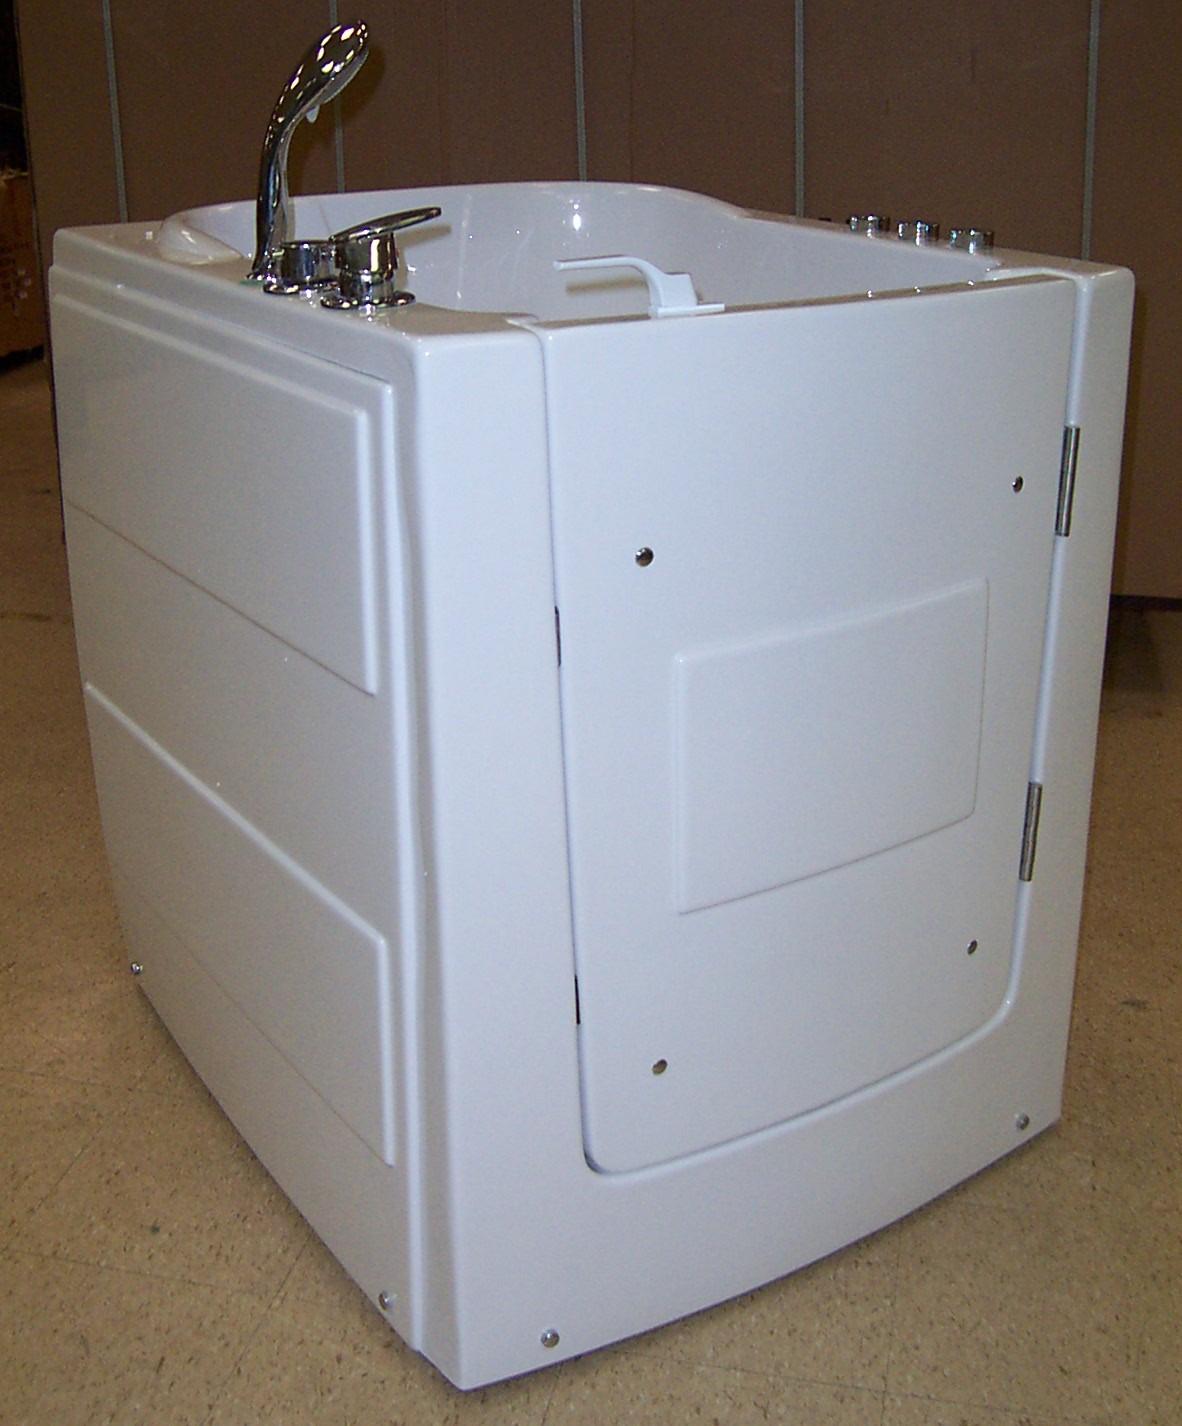 Luxury Spas And Whirlpool Bathtubs 9w03 Walk In Tub Special